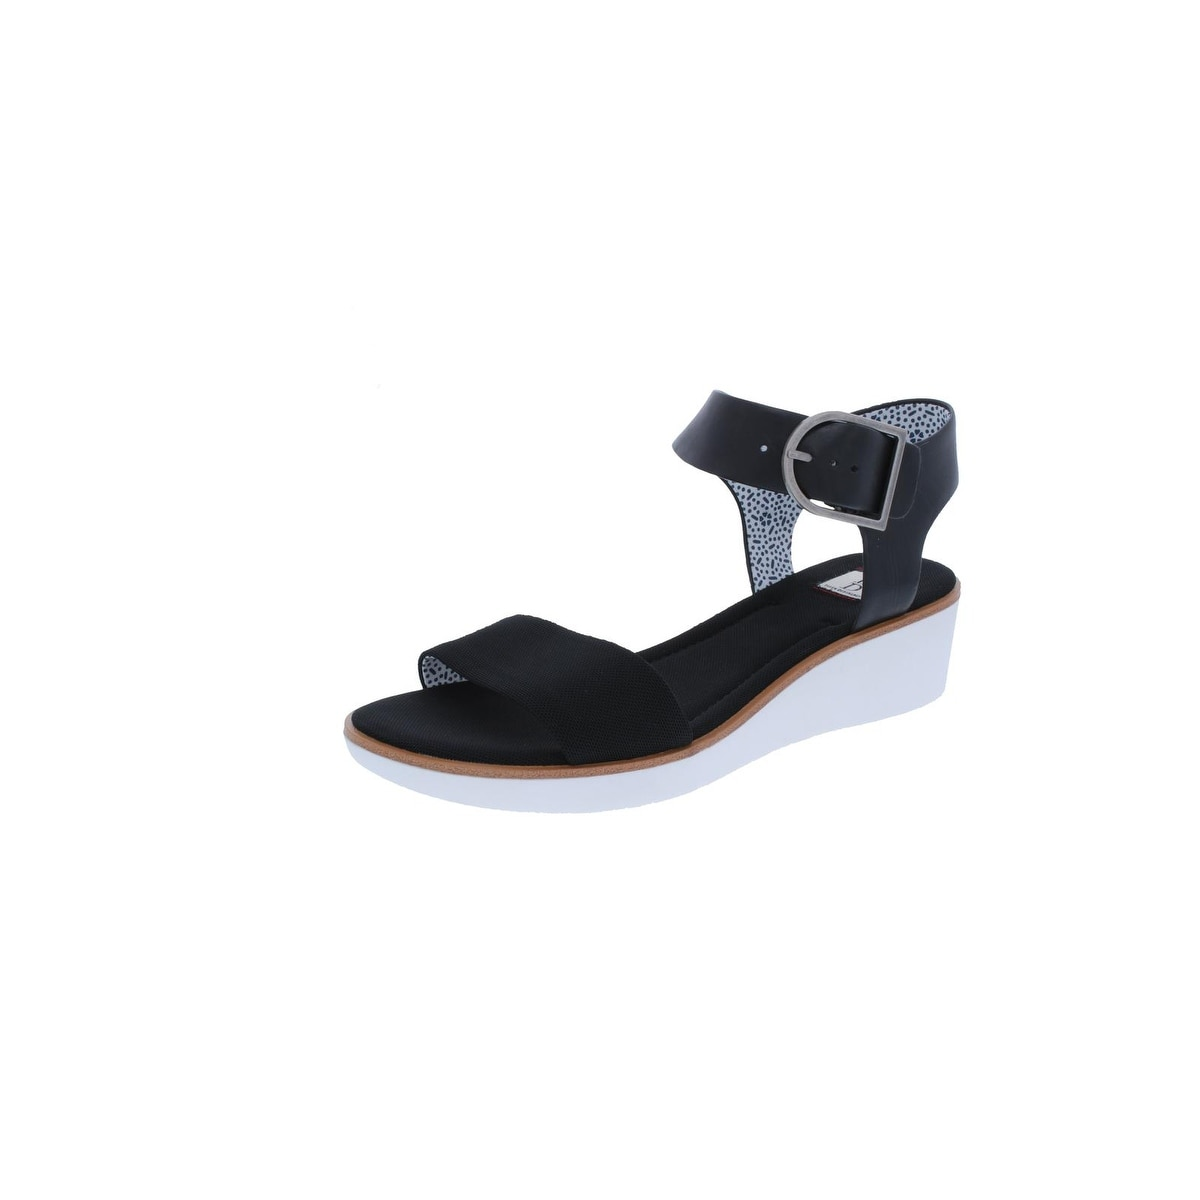 0e3d62fc9ee Shop ED Ellen DeGeneres Womens Stella Wedge Sandals Open Toe Ankle ...